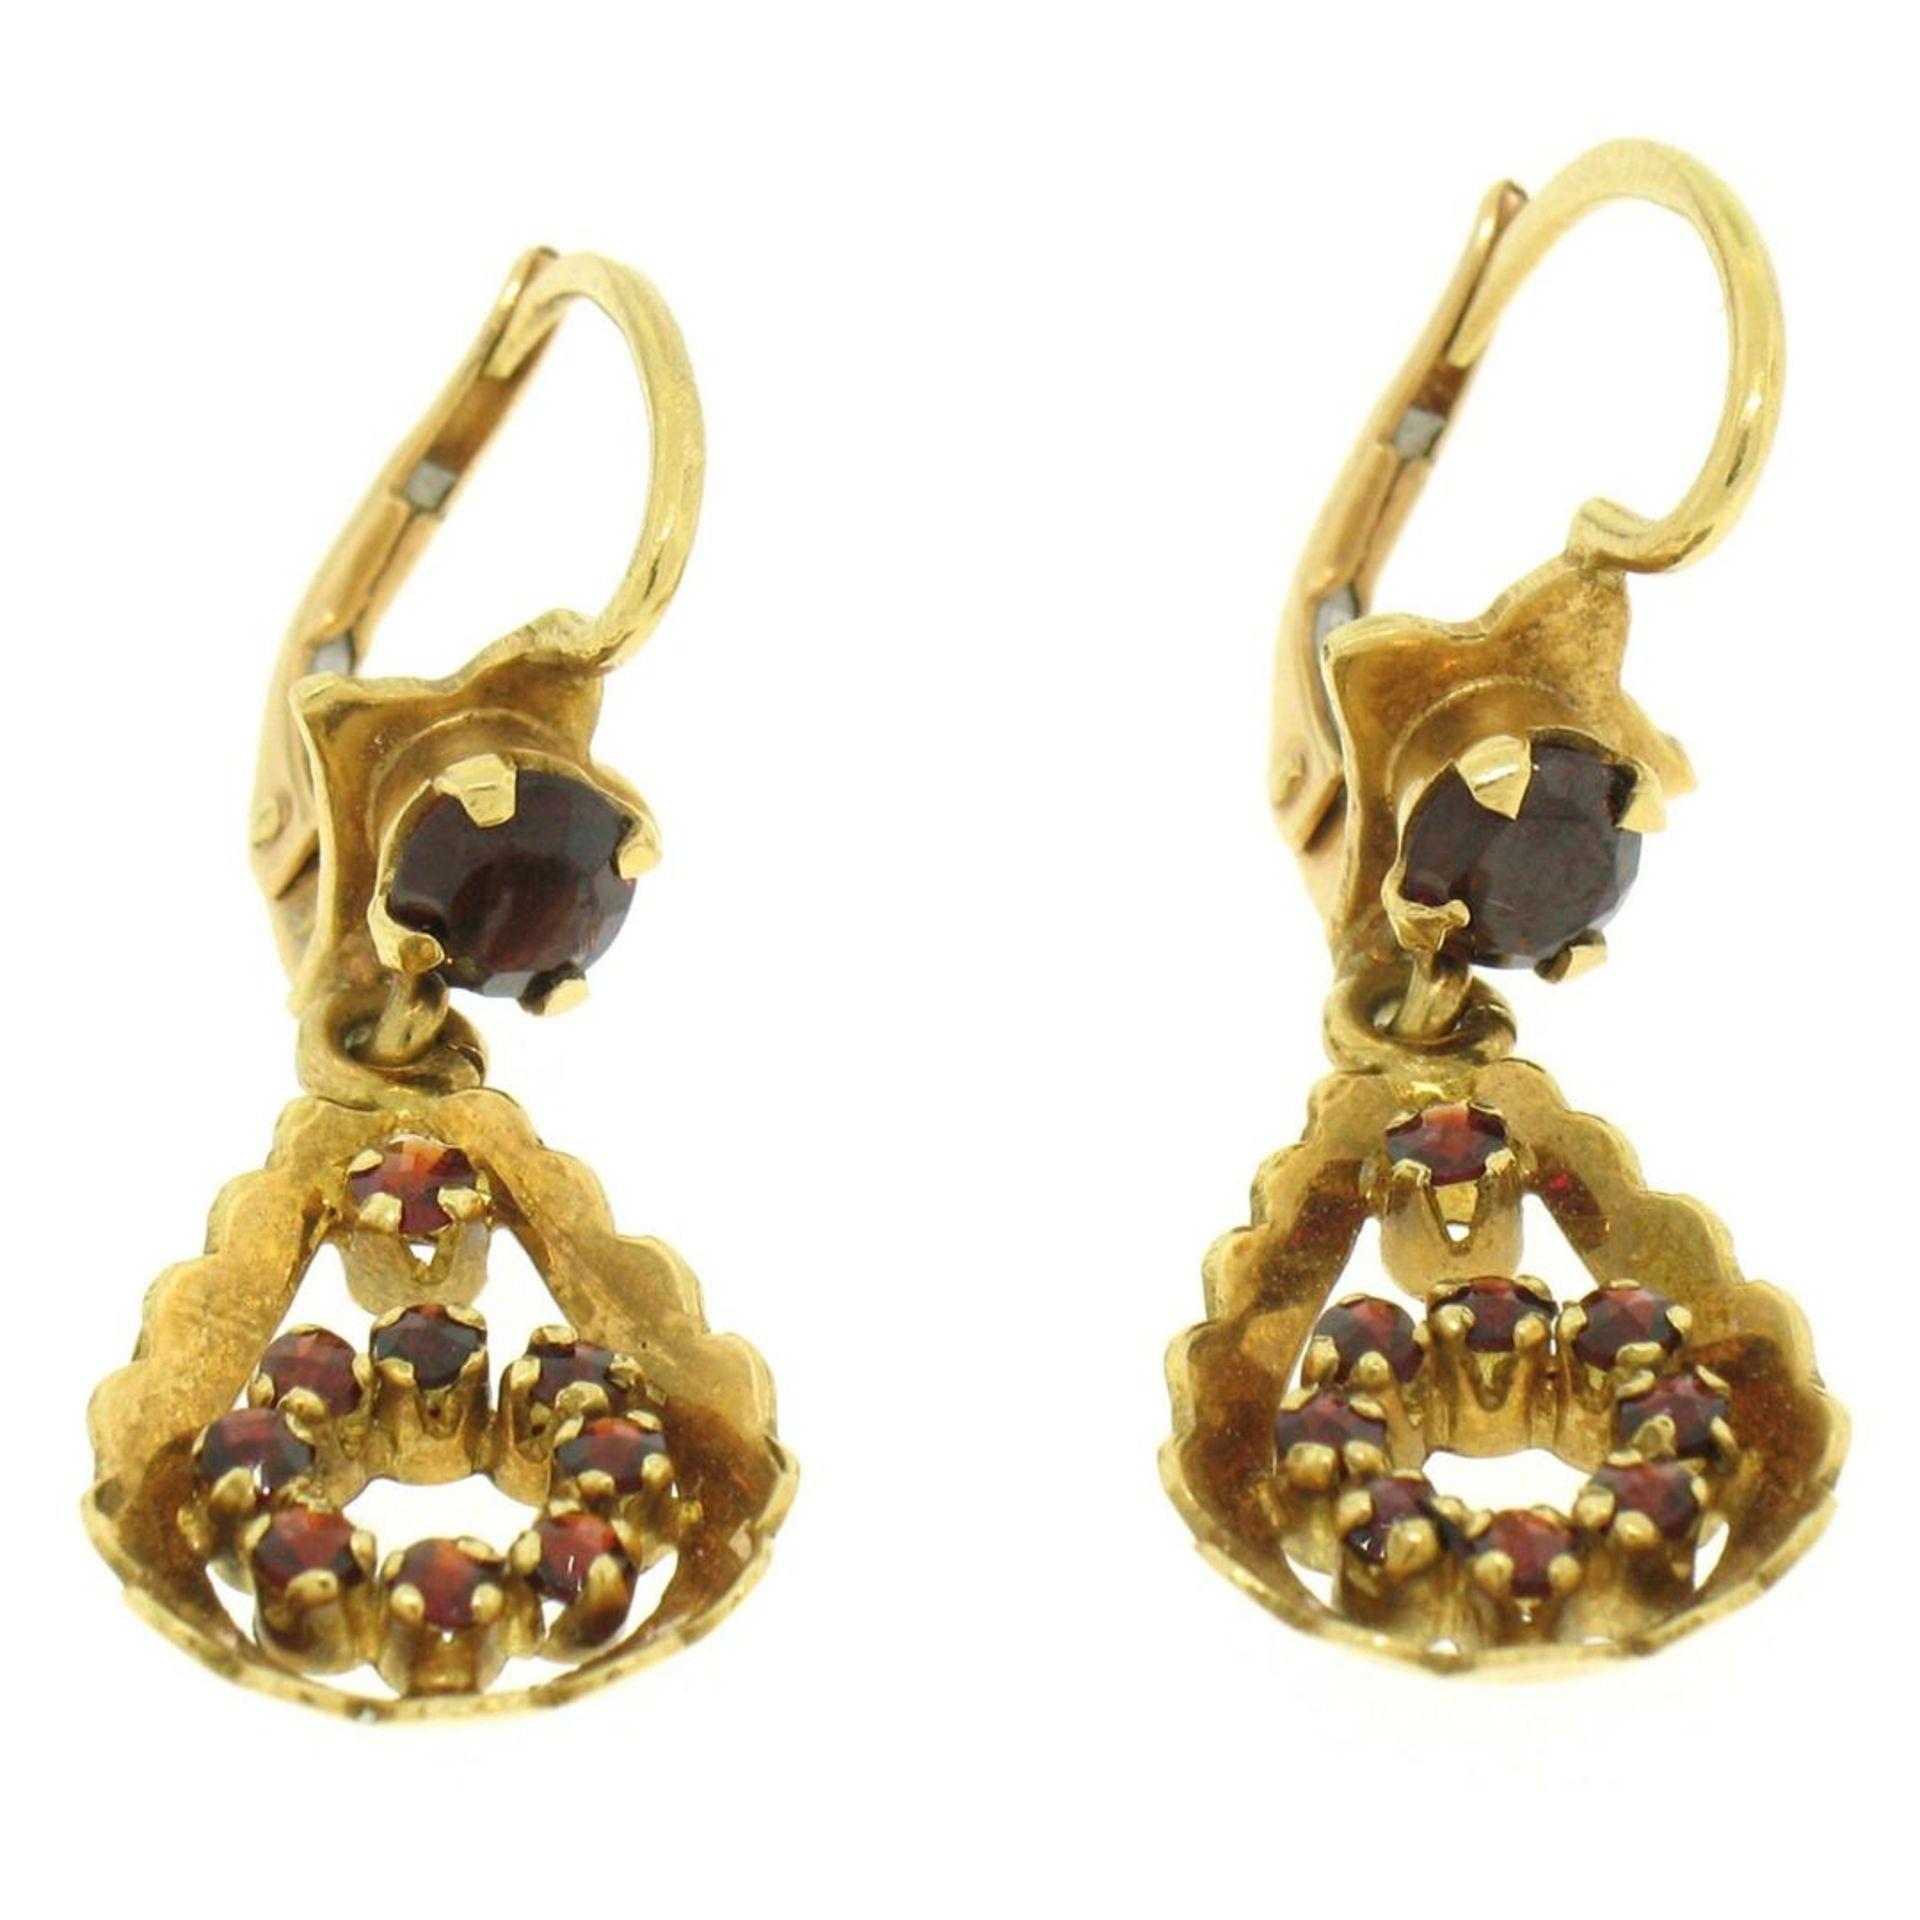 Vintage 18K Yellow Gold 1.0 ctw Pear Shape Garnet Dangle Drop Lever Back Earring - Image 7 of 8